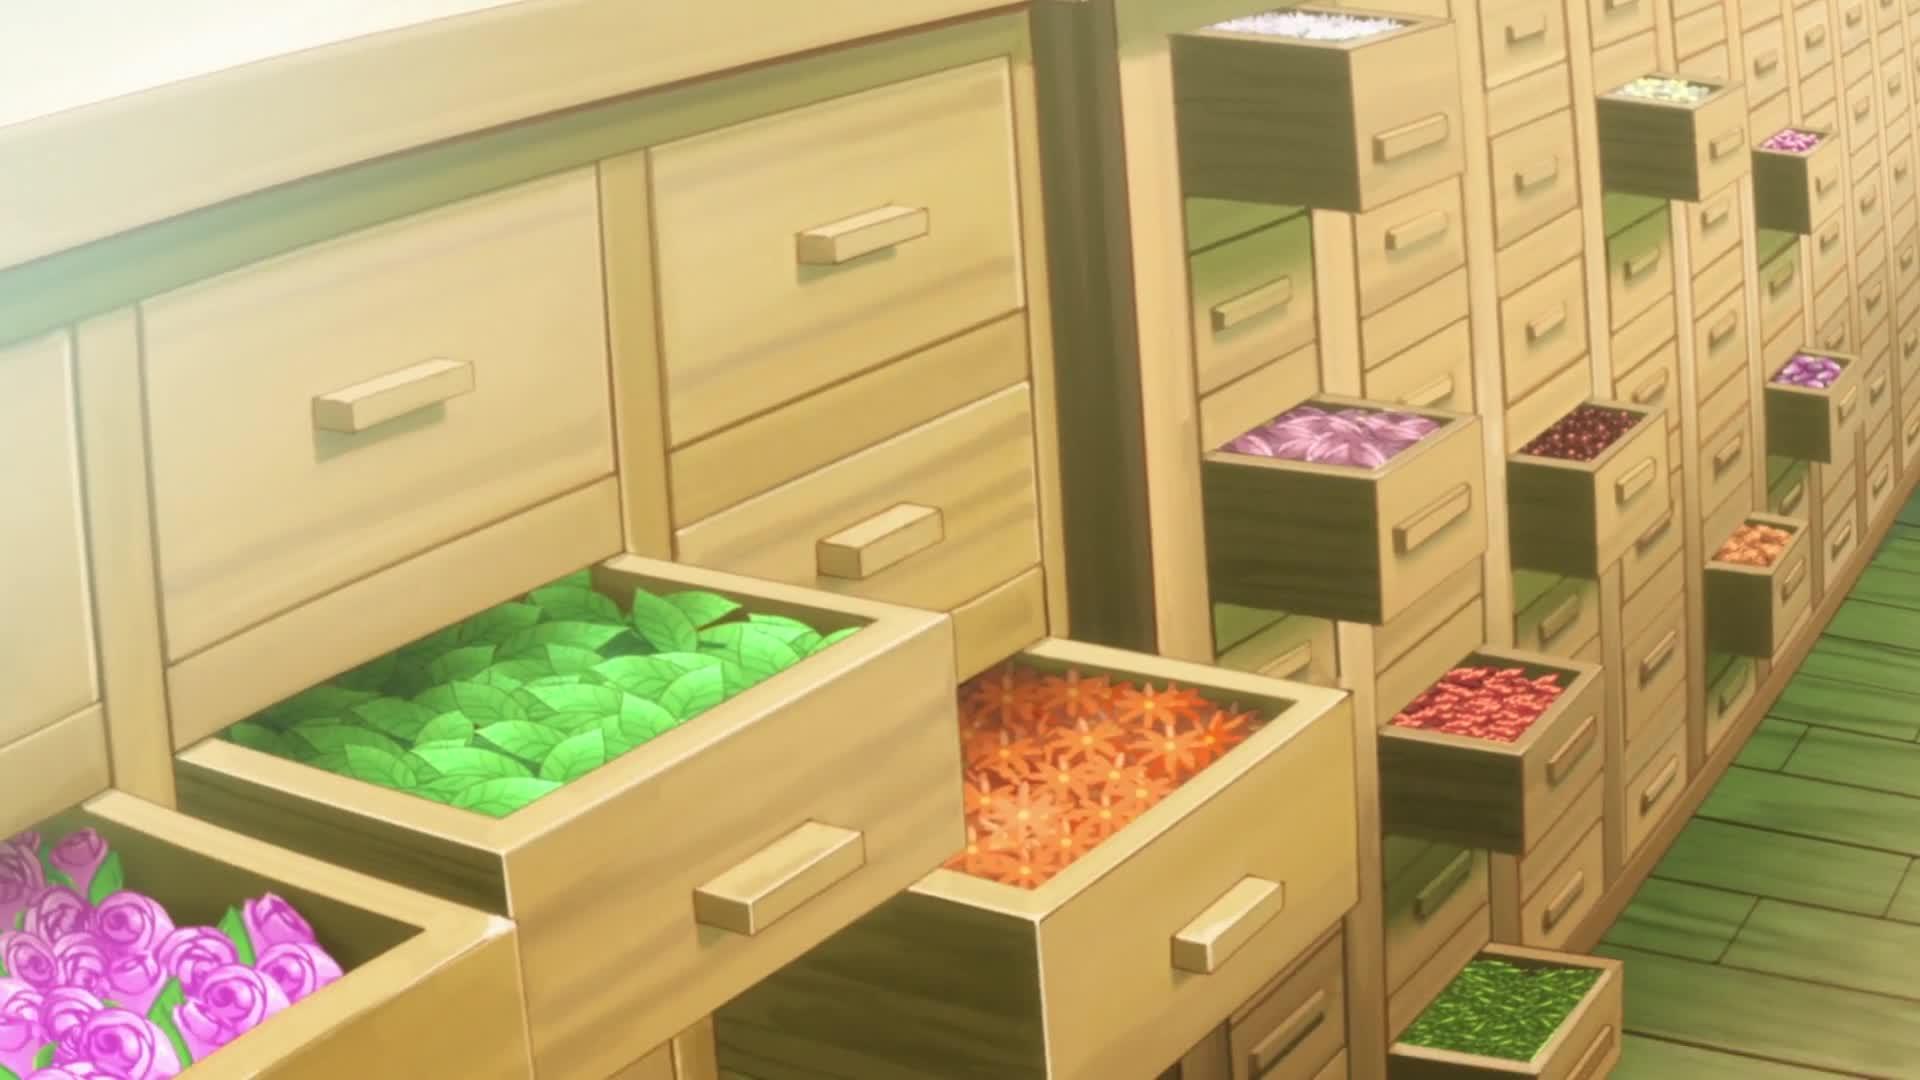 Cheat Kusushi no Slow Life: Isekai ni Tsukurou Drugstore